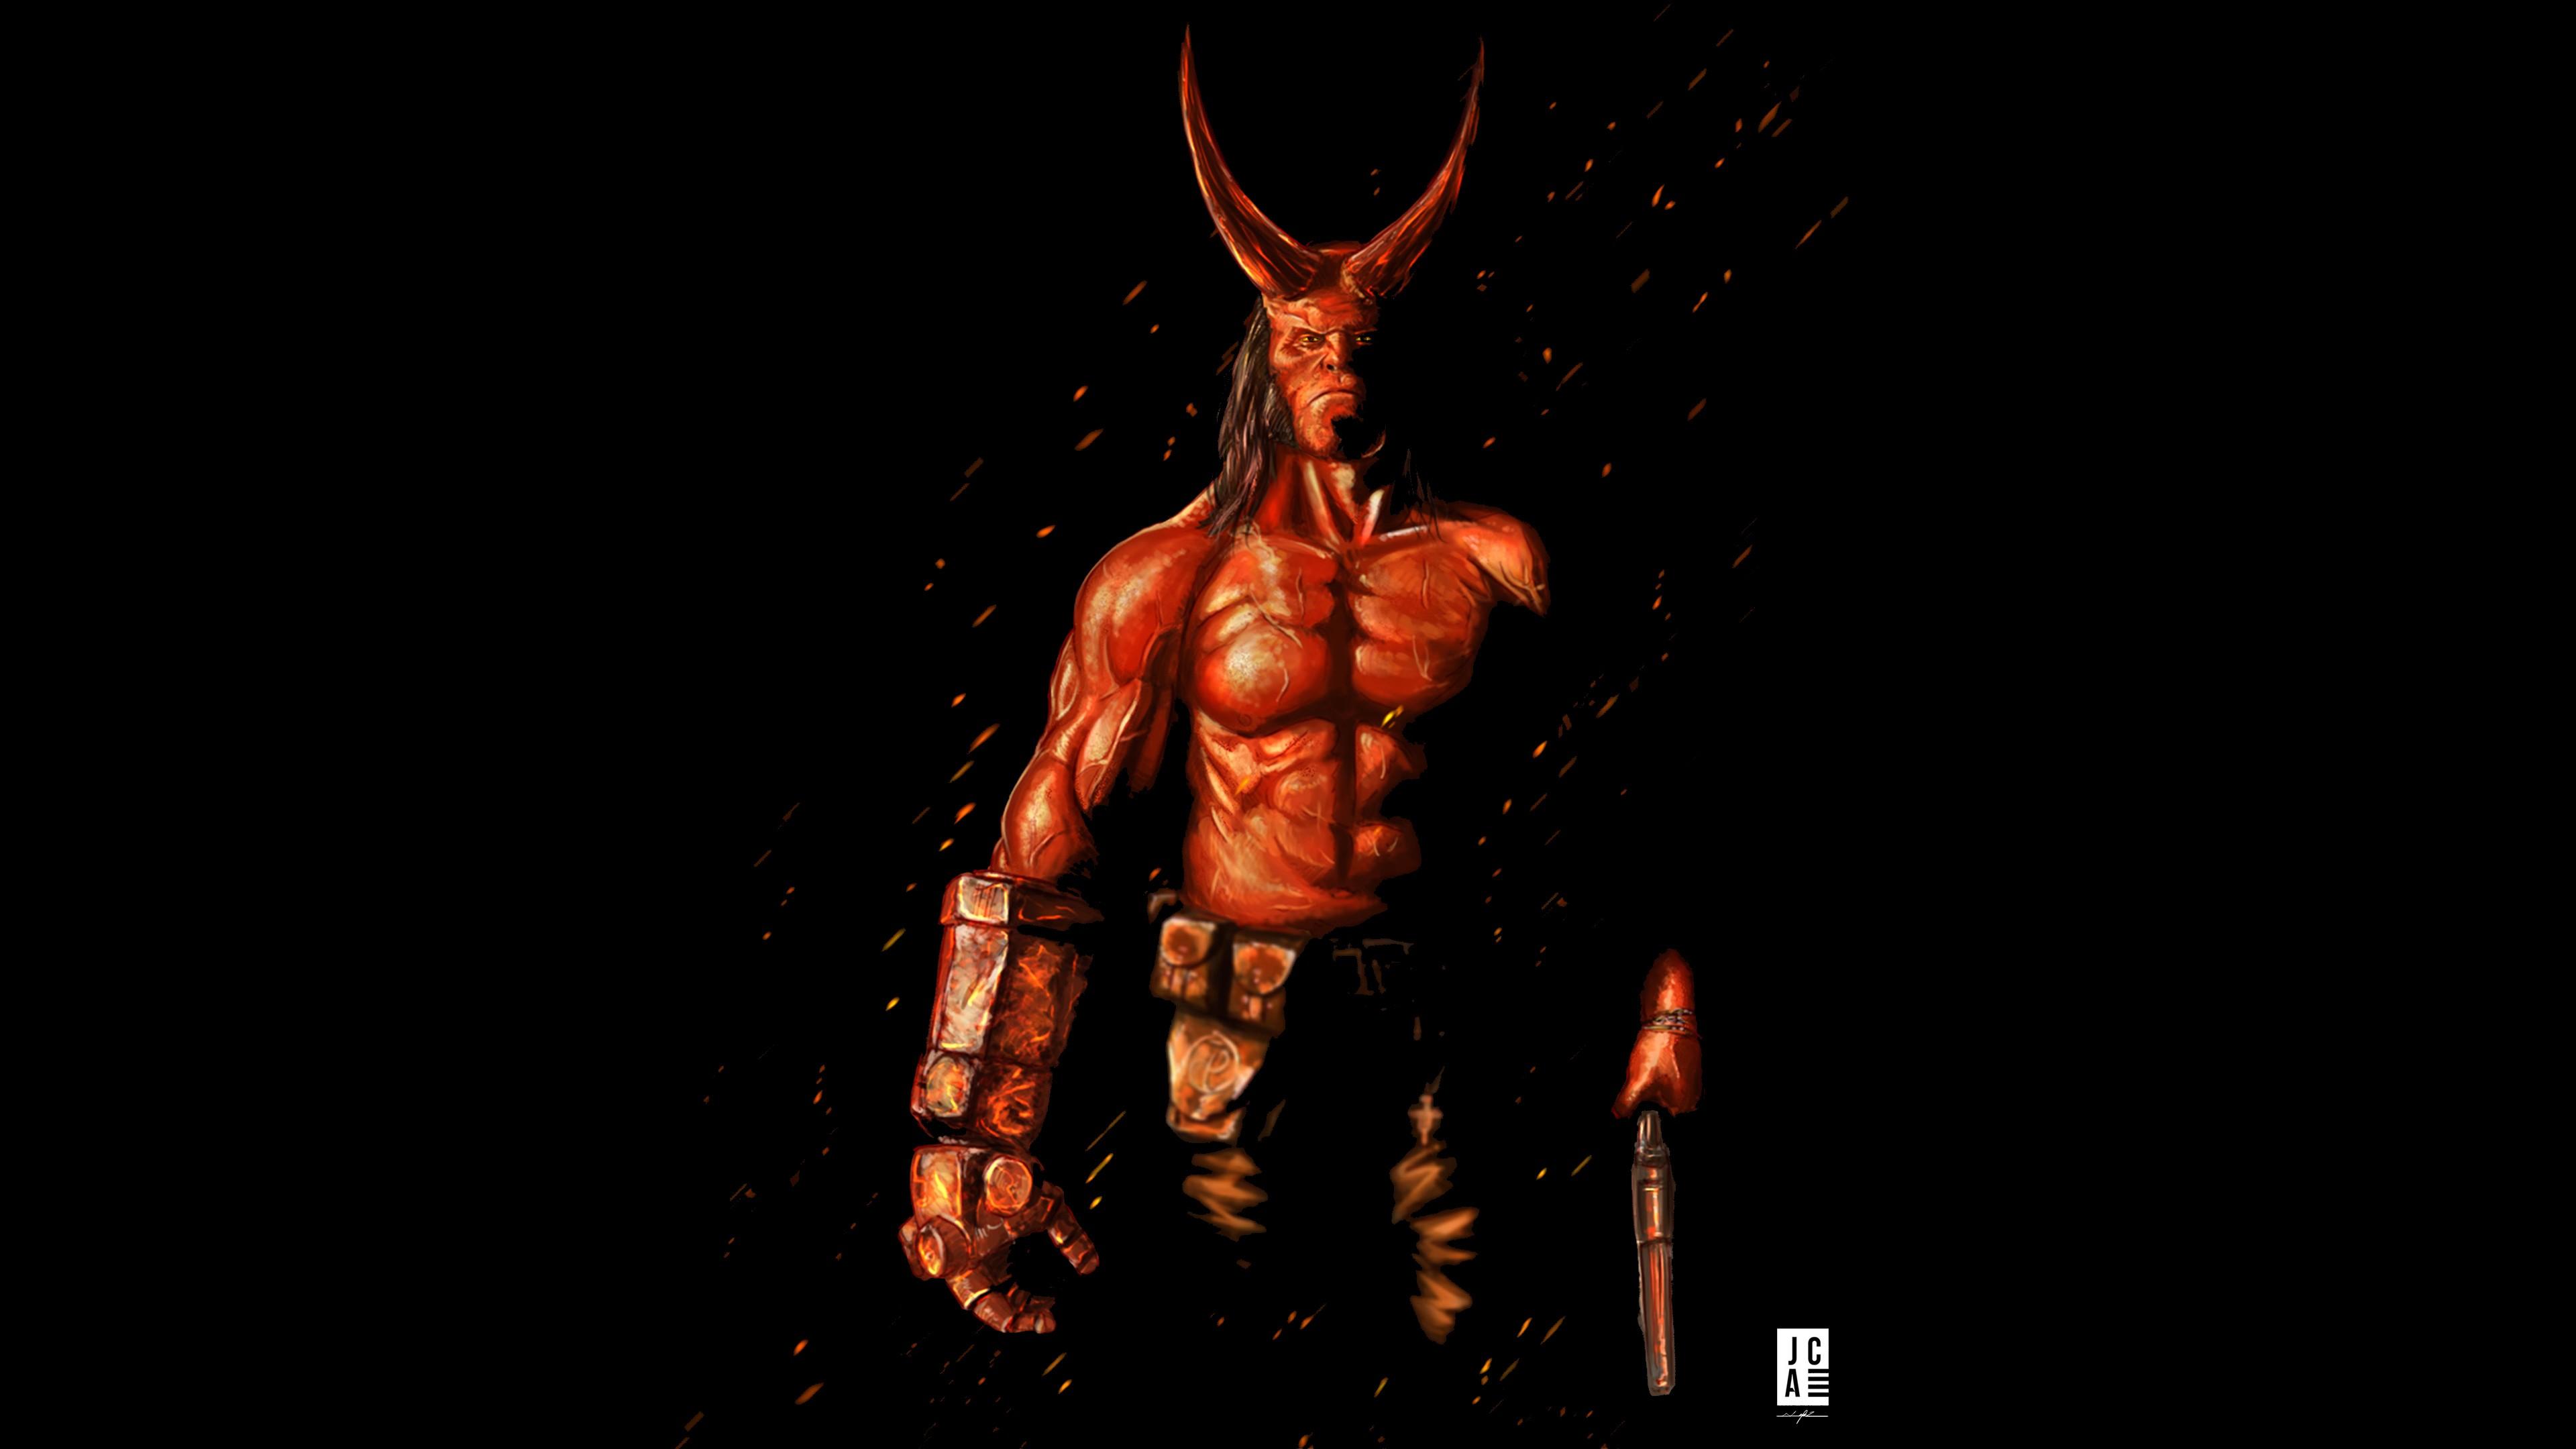 Wallpaper Hellboy David Harbour Poster 4k Movies 18269